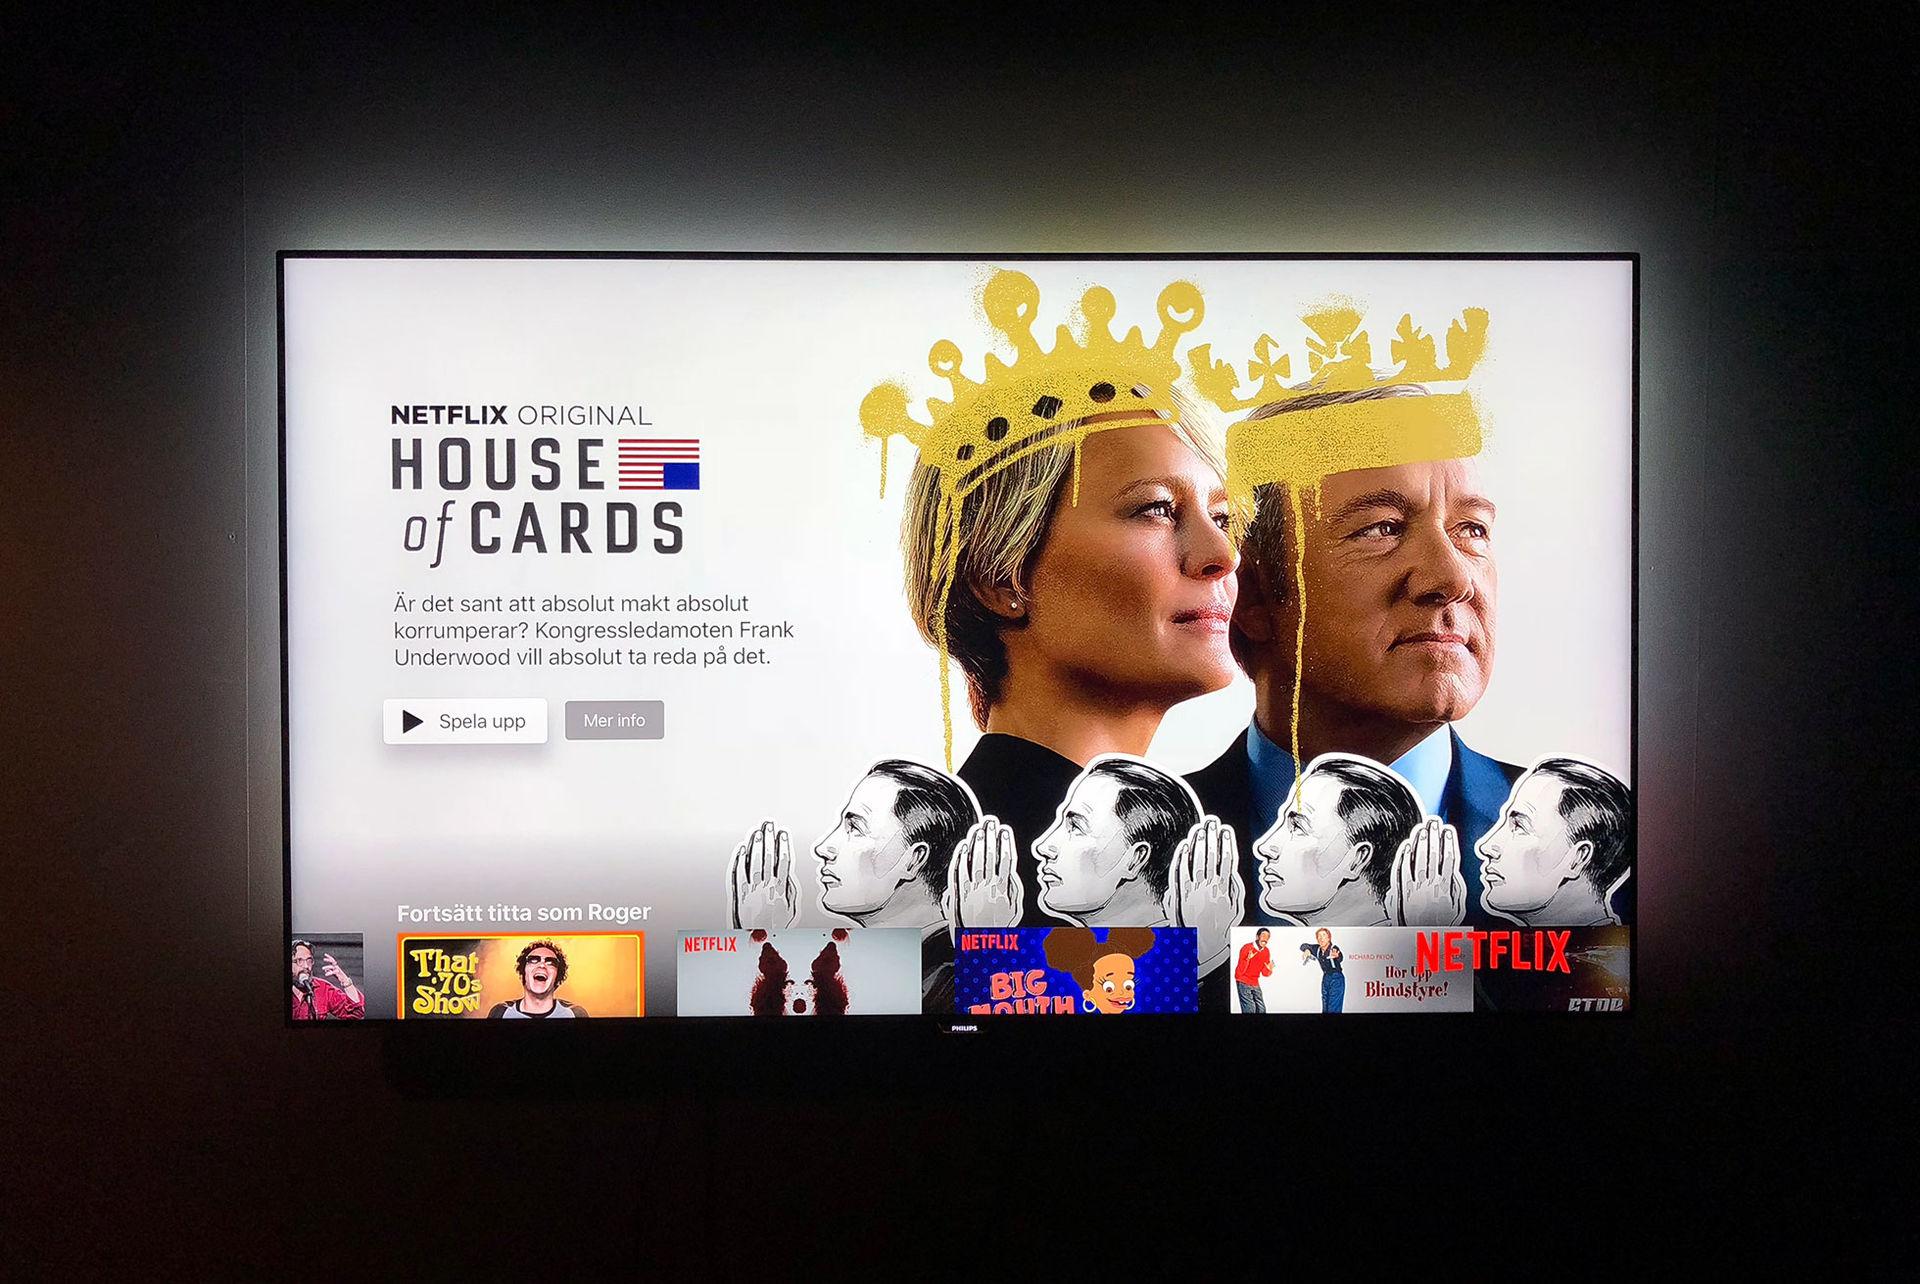 Netflix lägger ner House of Cards